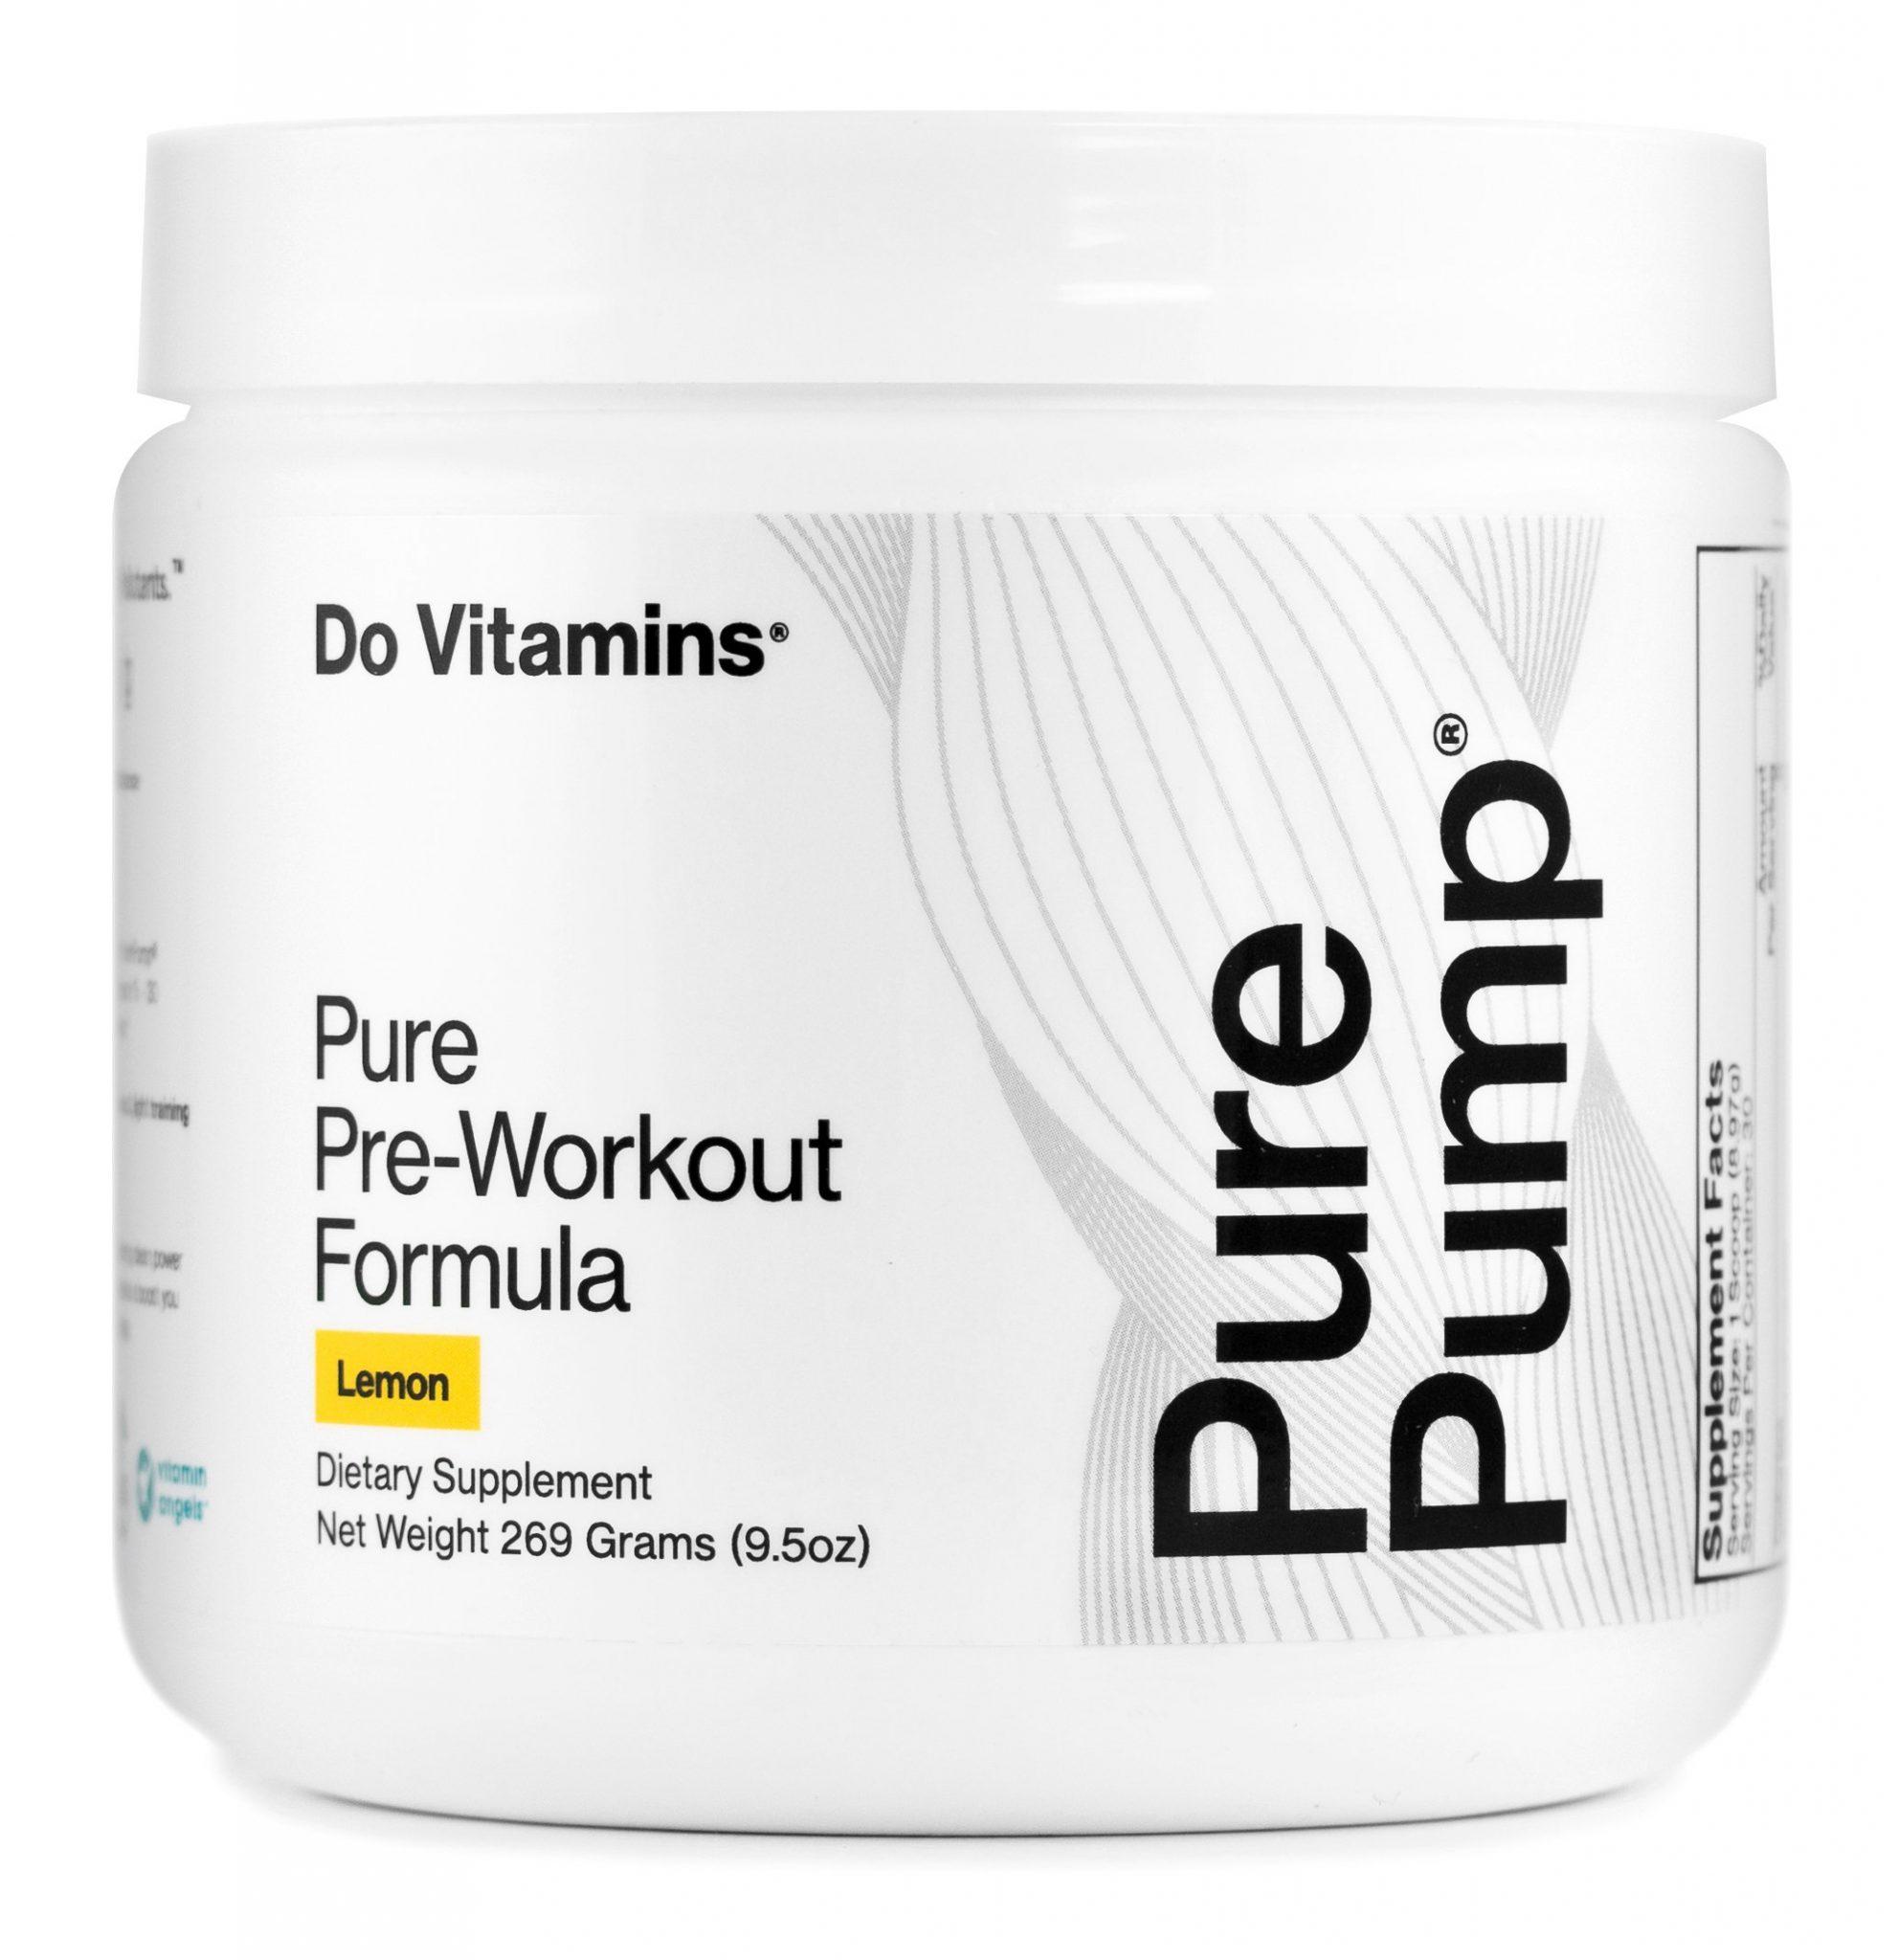 PurePump Lemon - Do Vitamins - Certified Paleo, Keto Certified, Paleo Friendly, PaleoVegan by the Paleo Foundation